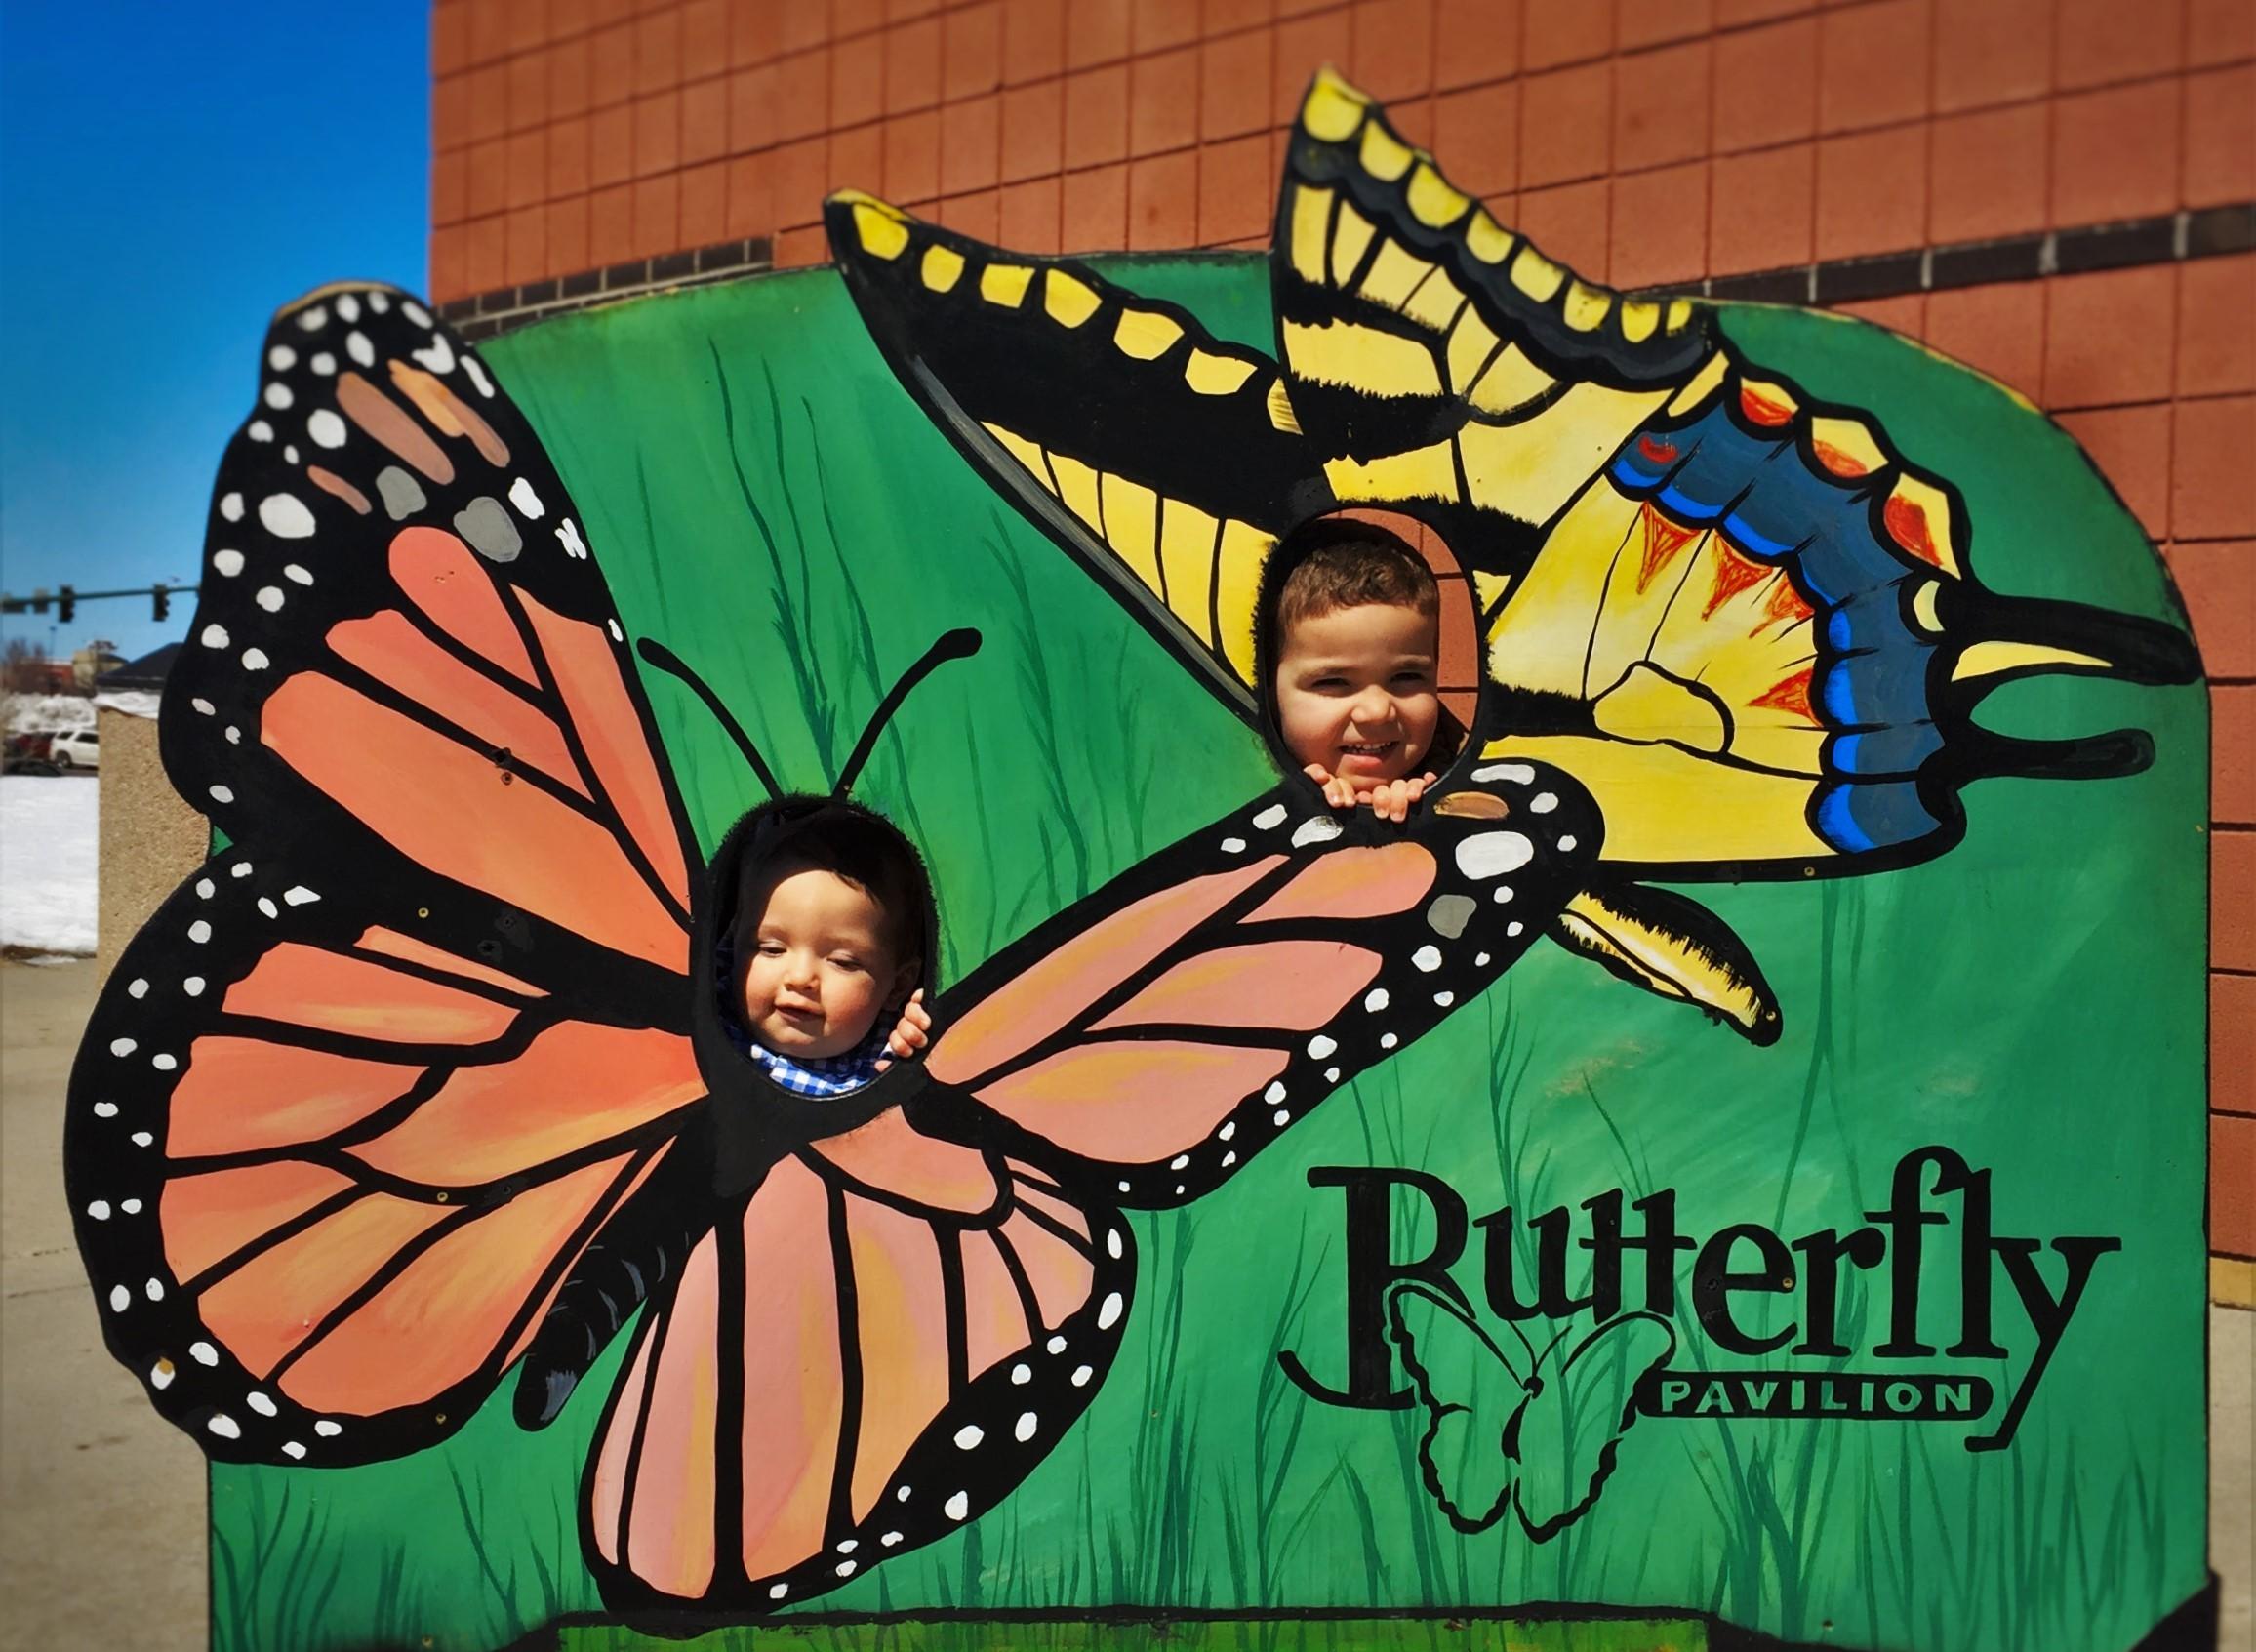 Taylor-Kids-as-Butterflies-at-the-Butterfly-Pavilion-Denver-Colorado-1-e1460465845222.jpg